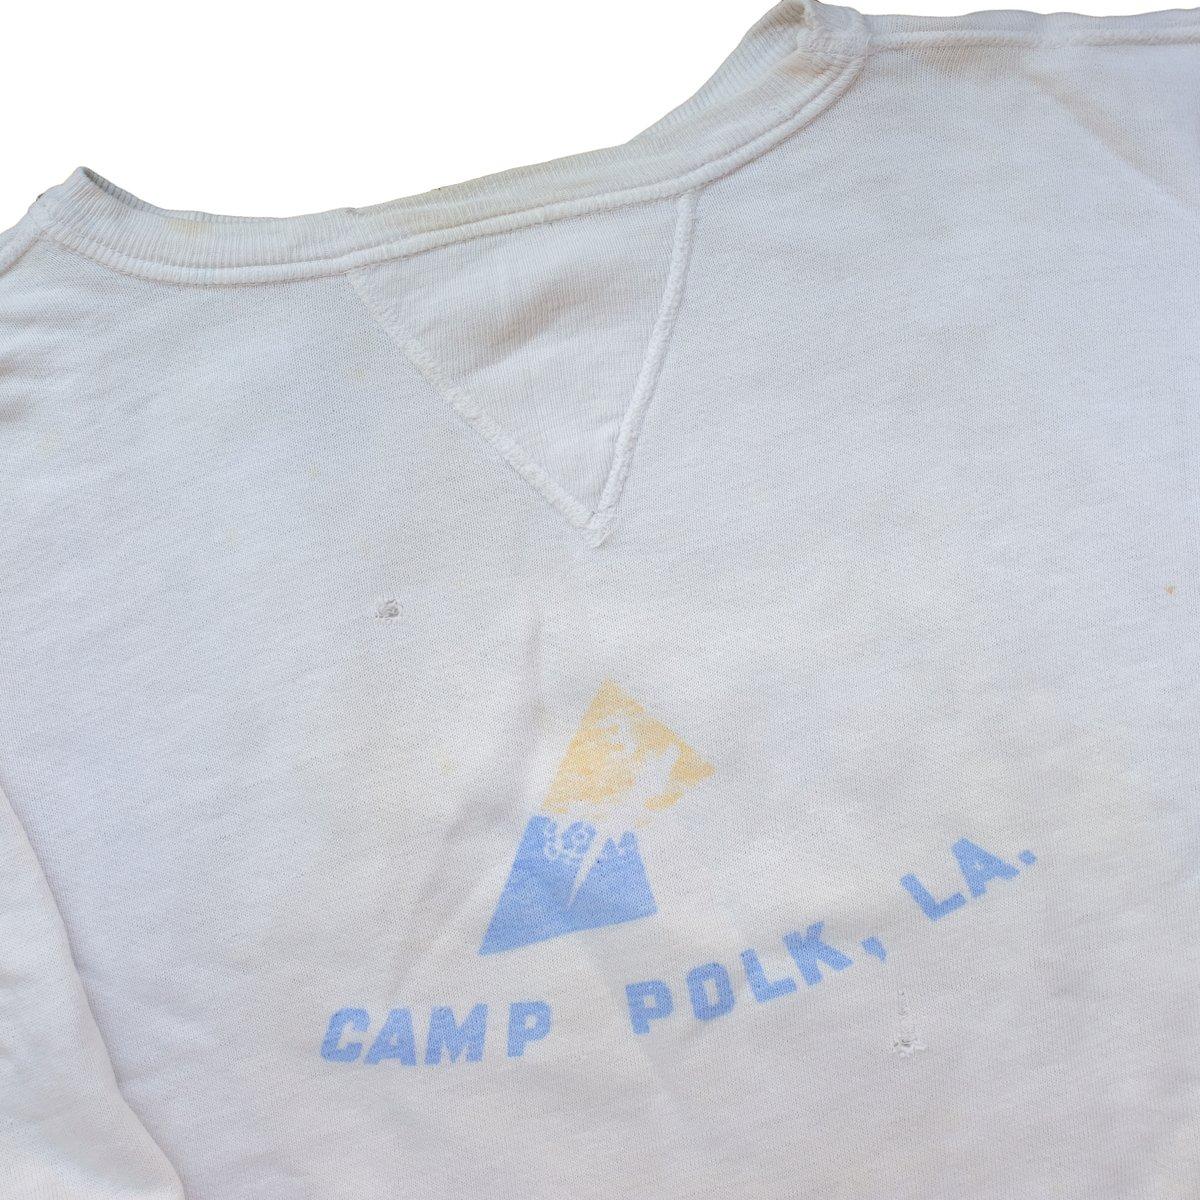 Image of 1950's Velva Sheen Camp Polk U.S. Army Sweatshirt